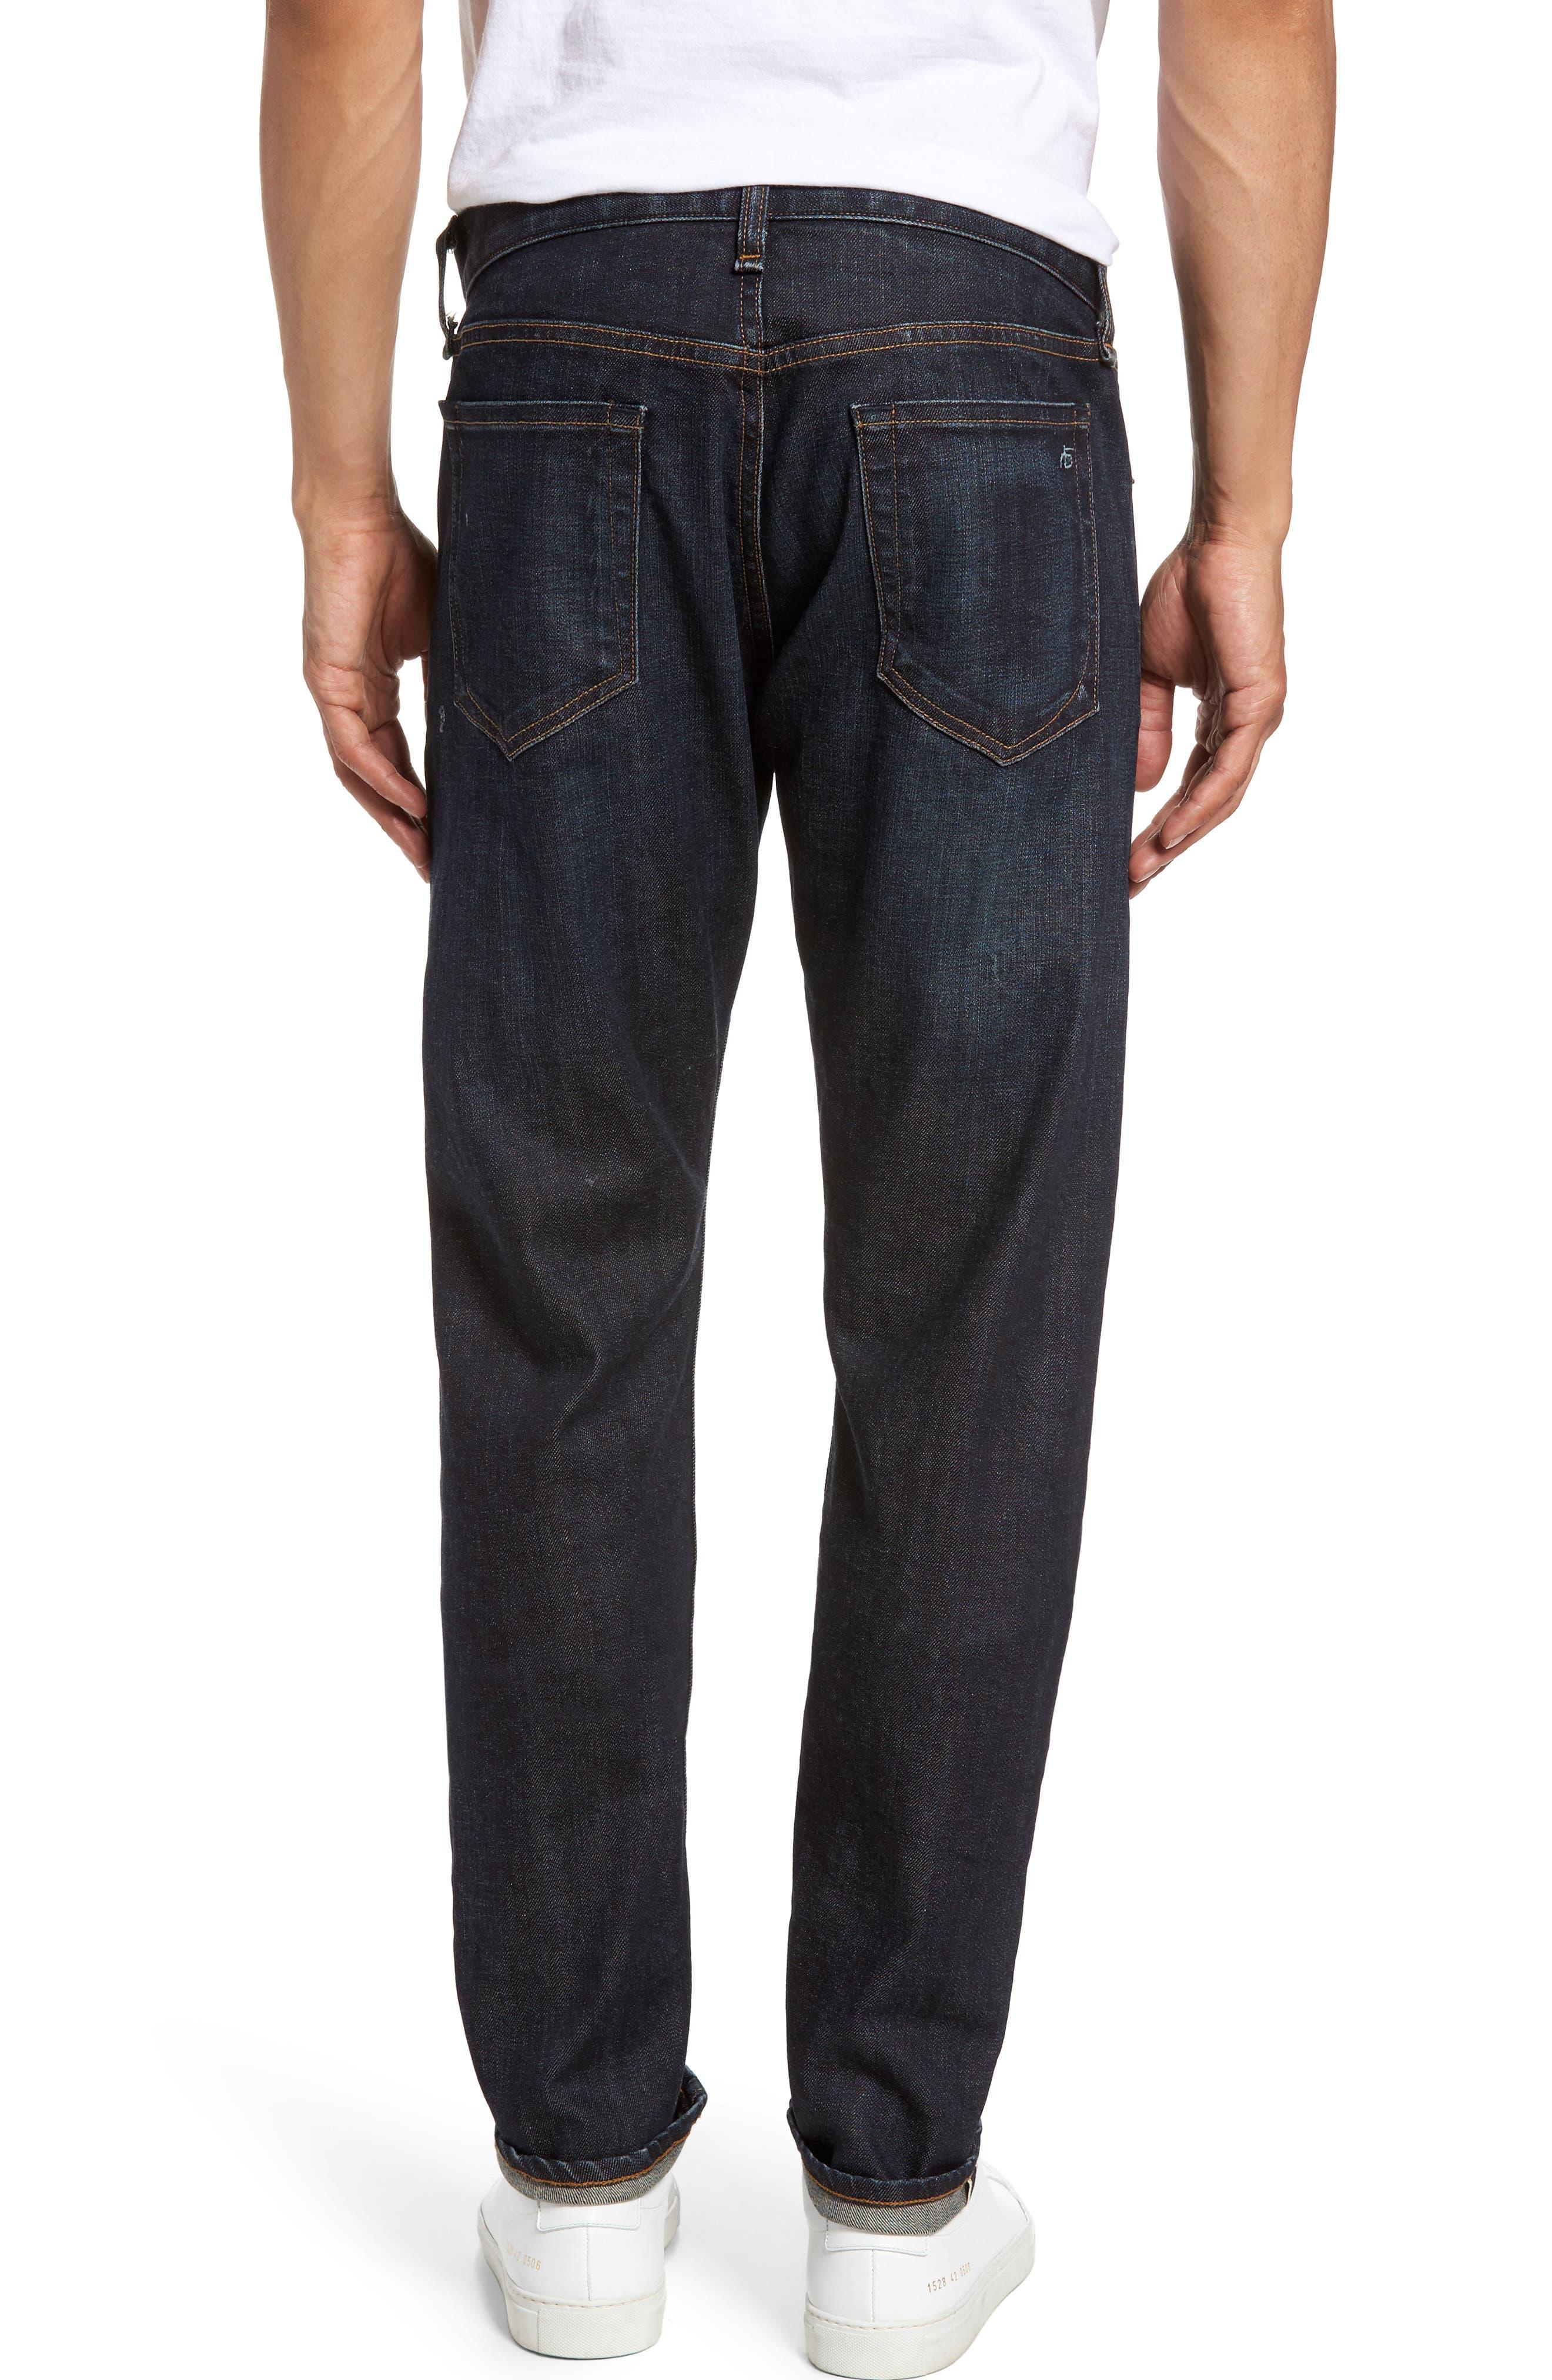 Alternate Image 2  - rag & bone Fit 2 Slim Fit Selvedge Jeans (Tempest)